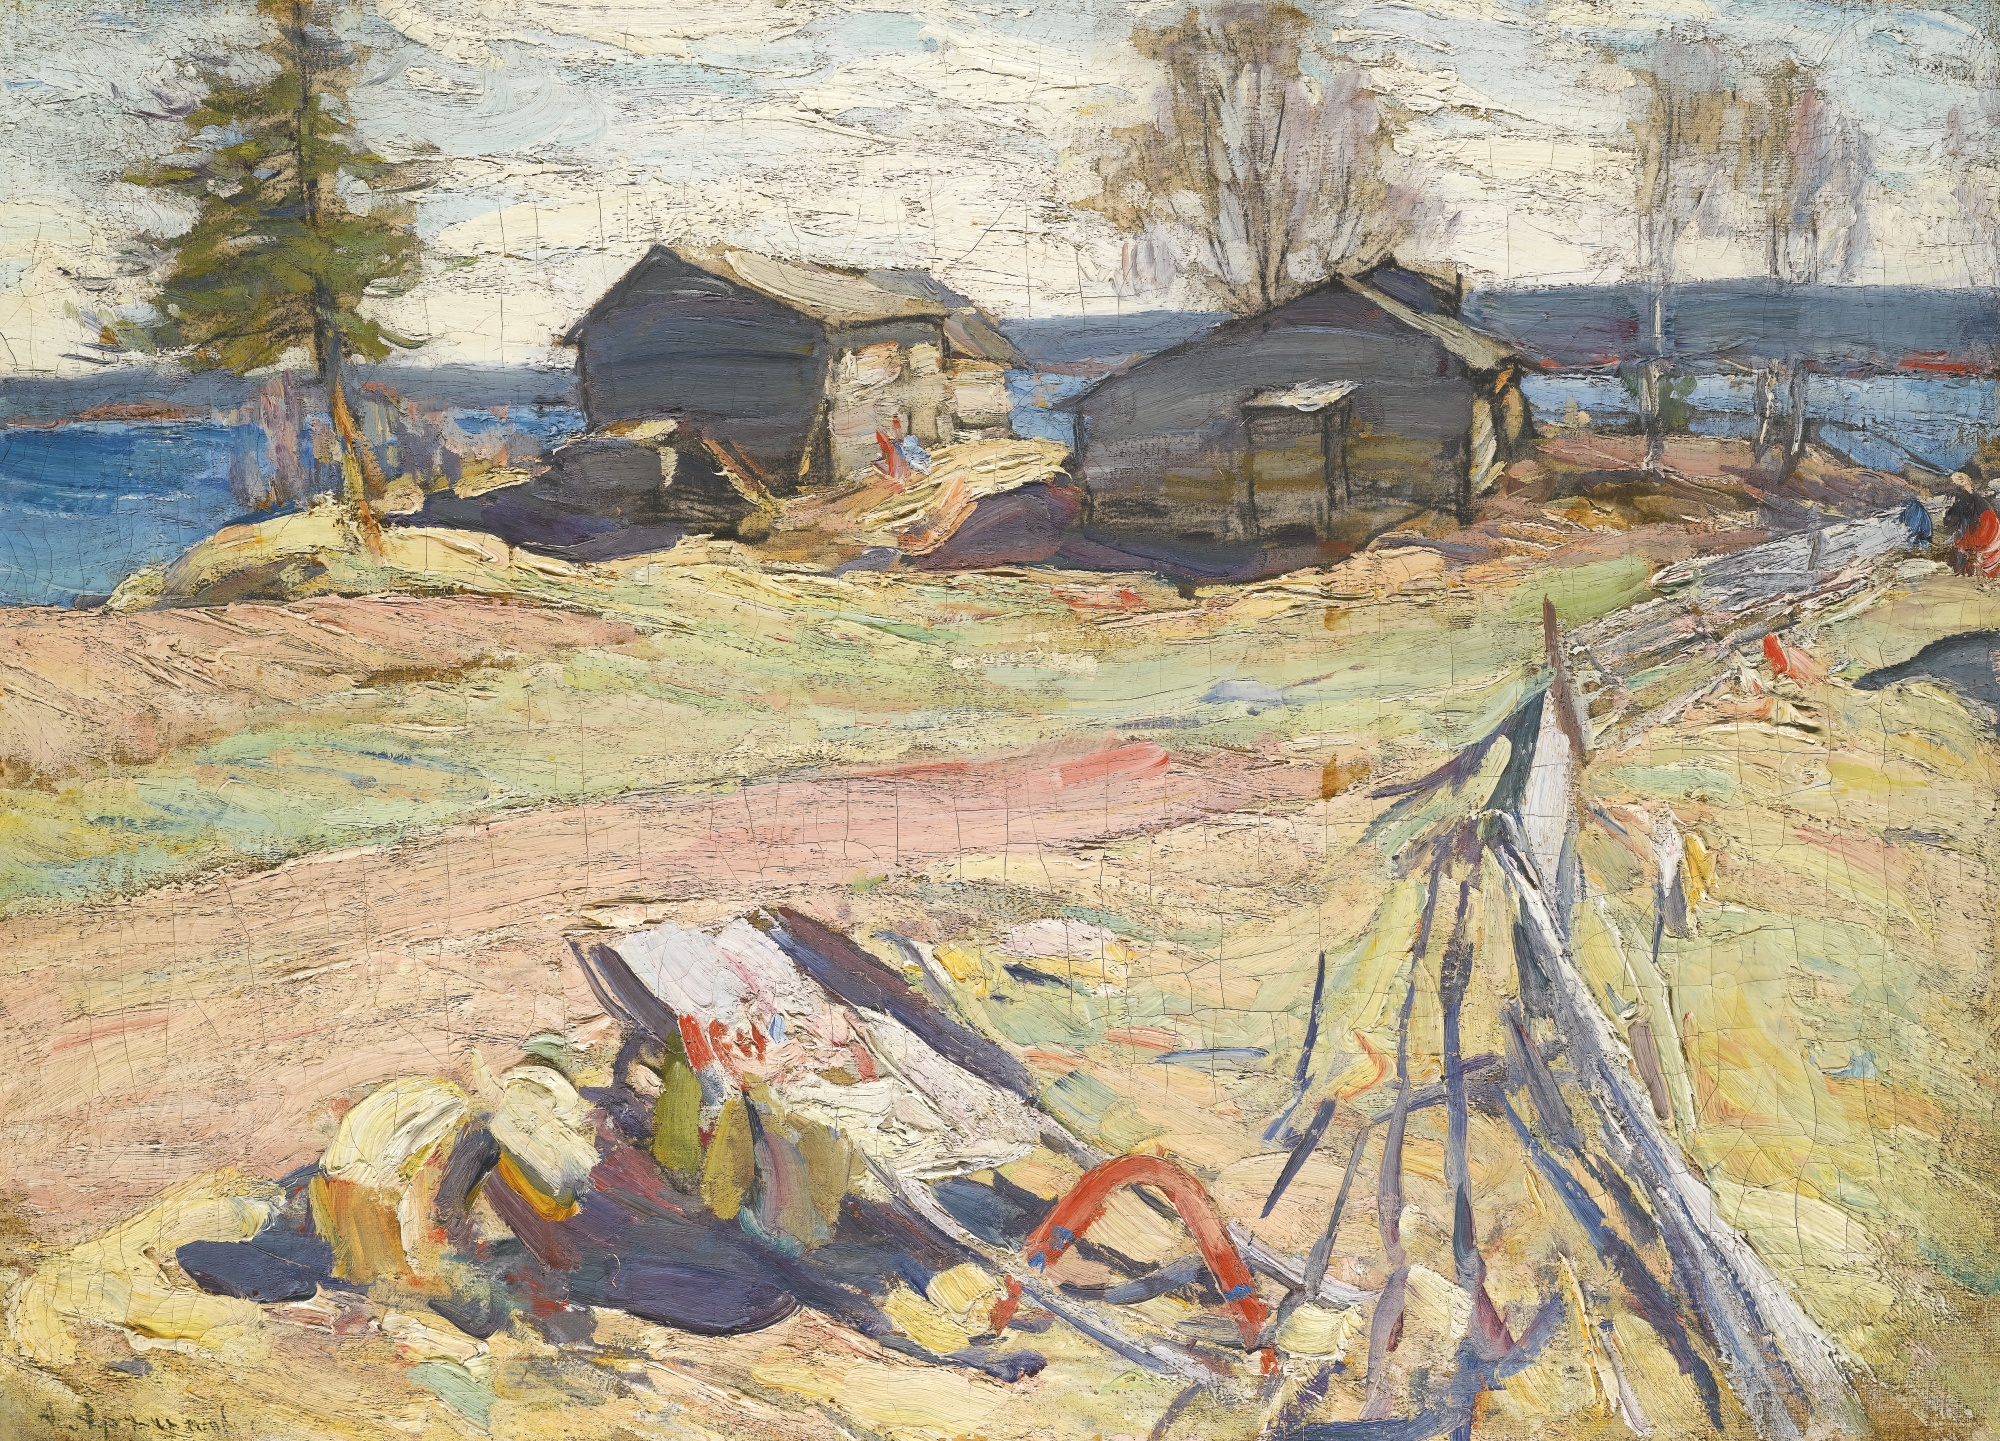 Архипов Абрам картина Деревня на севере пейзаж холст масло